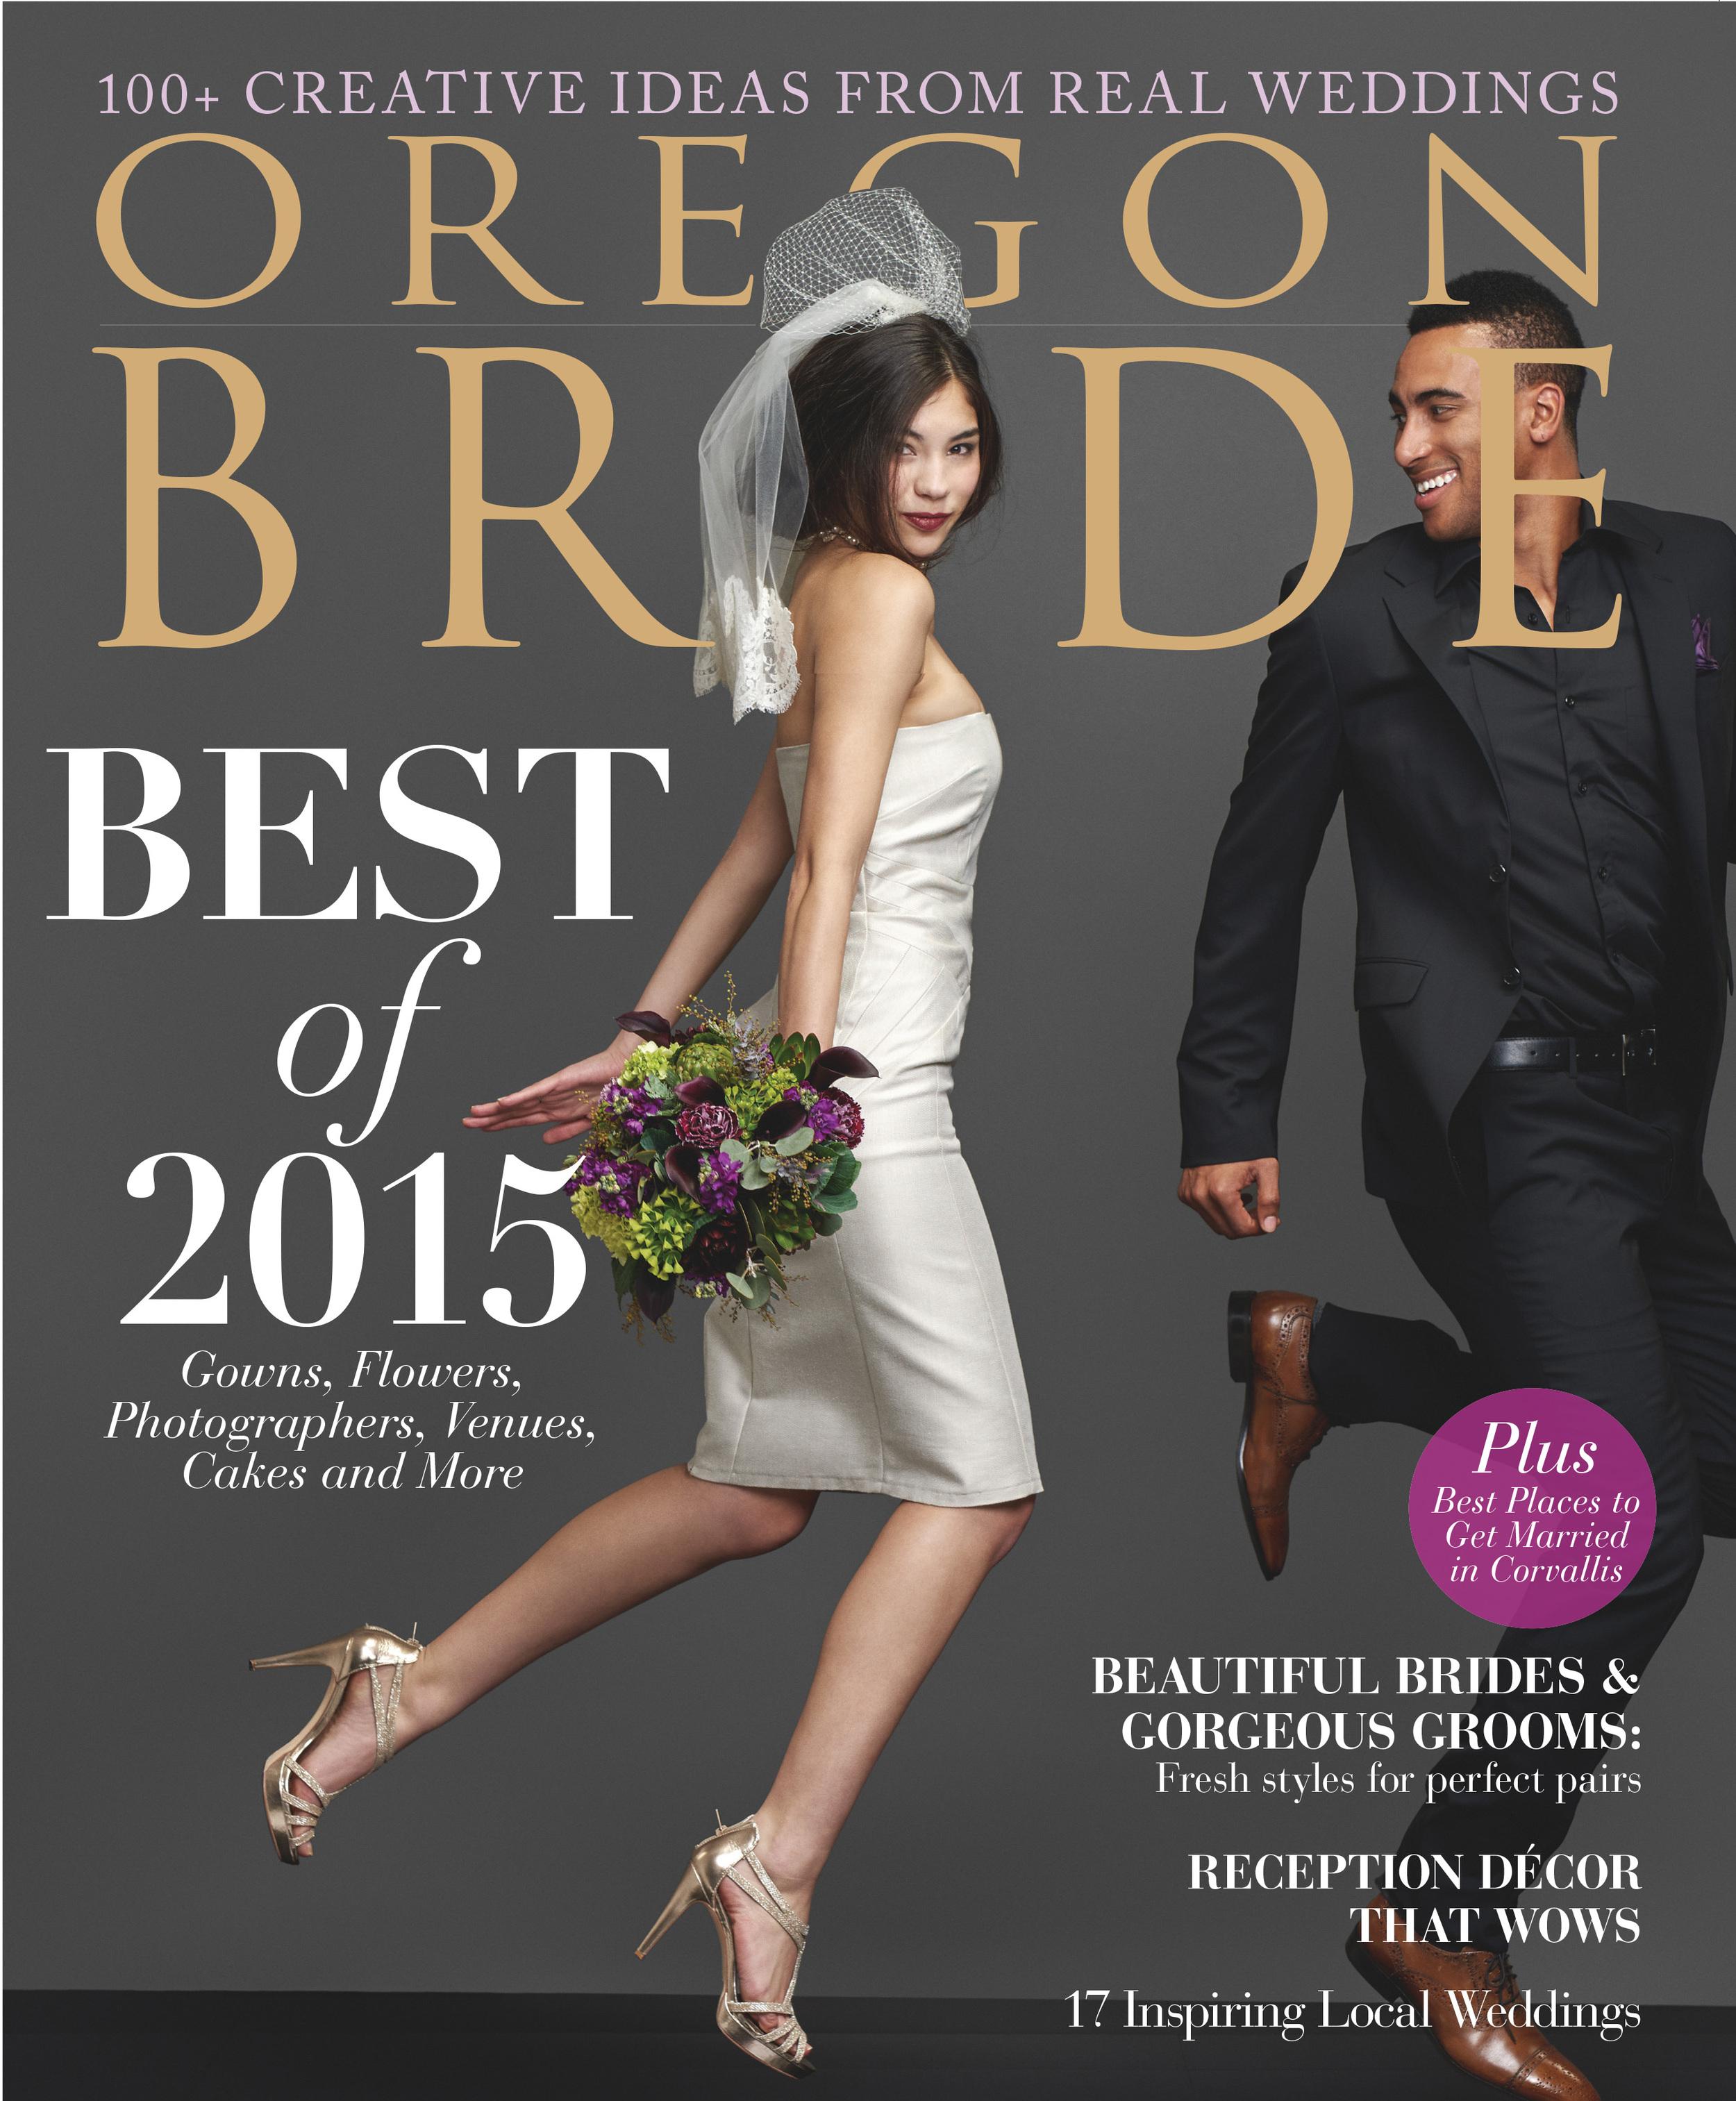 OR Bride Fall Winter 2015 Cover.jpg